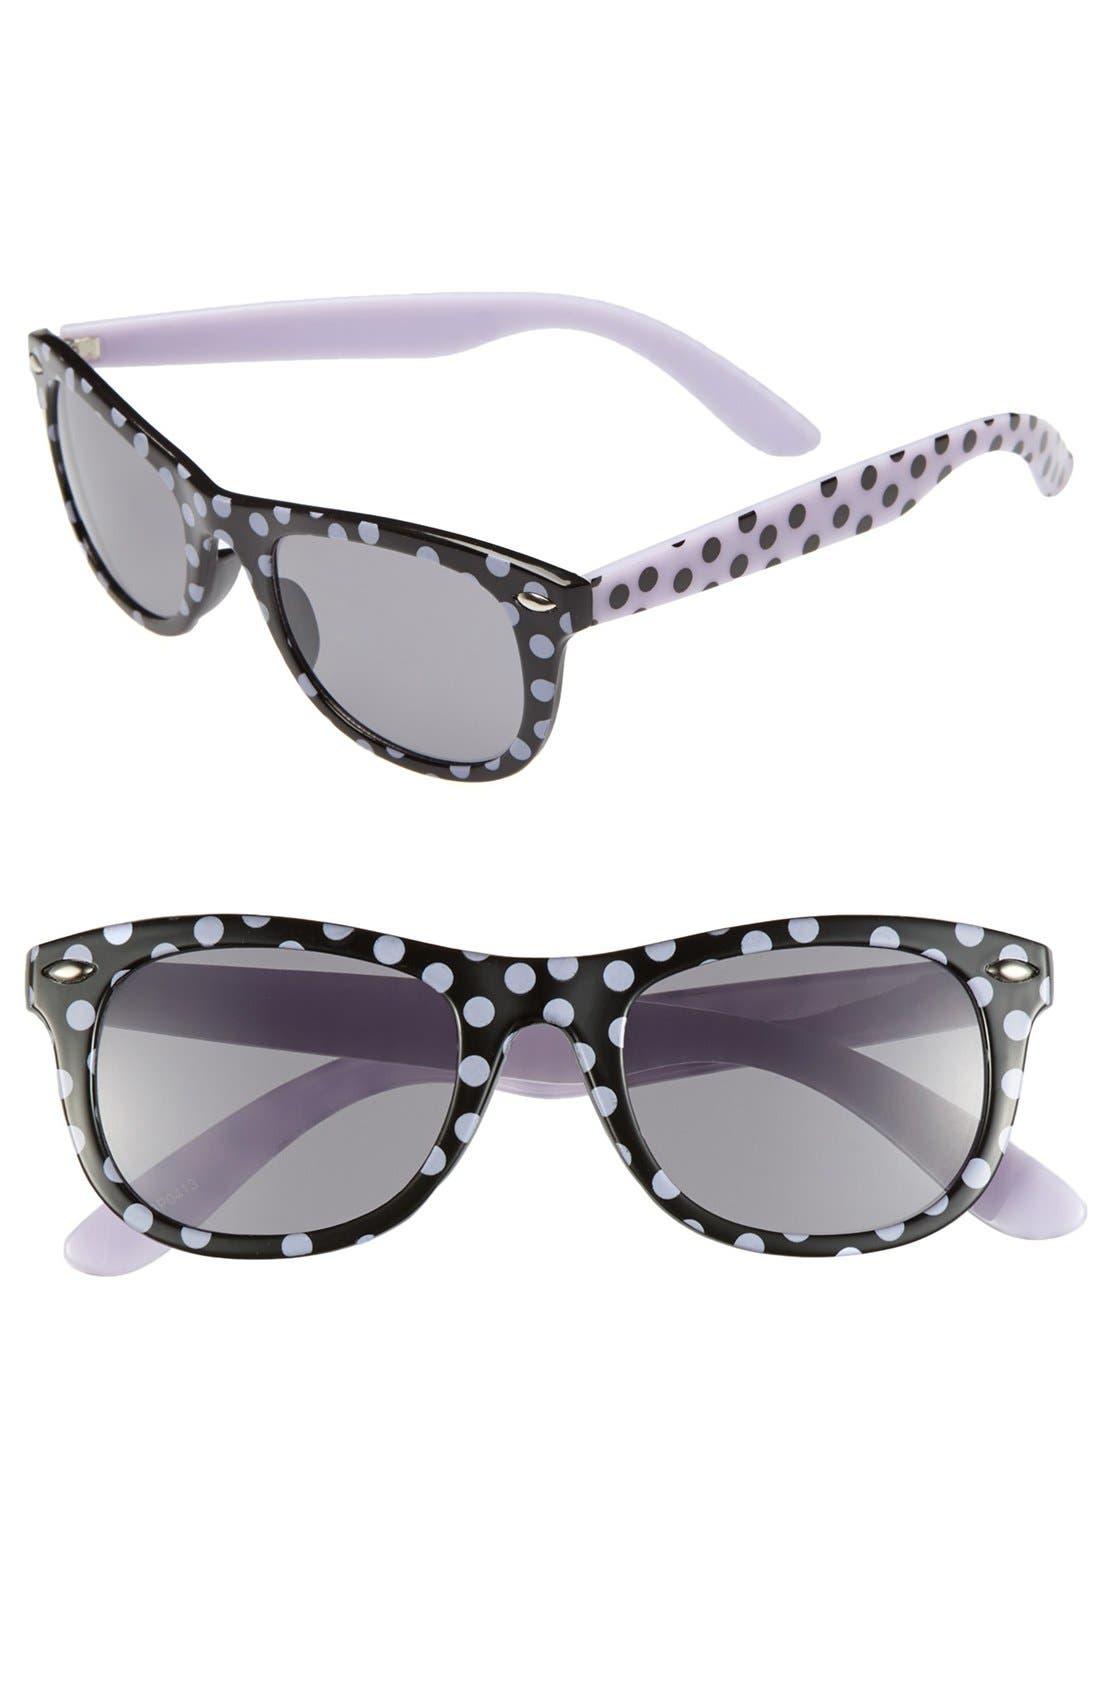 Alternate Image 1 Selected - Fantas Eyes Print Sunglasses (Girls)